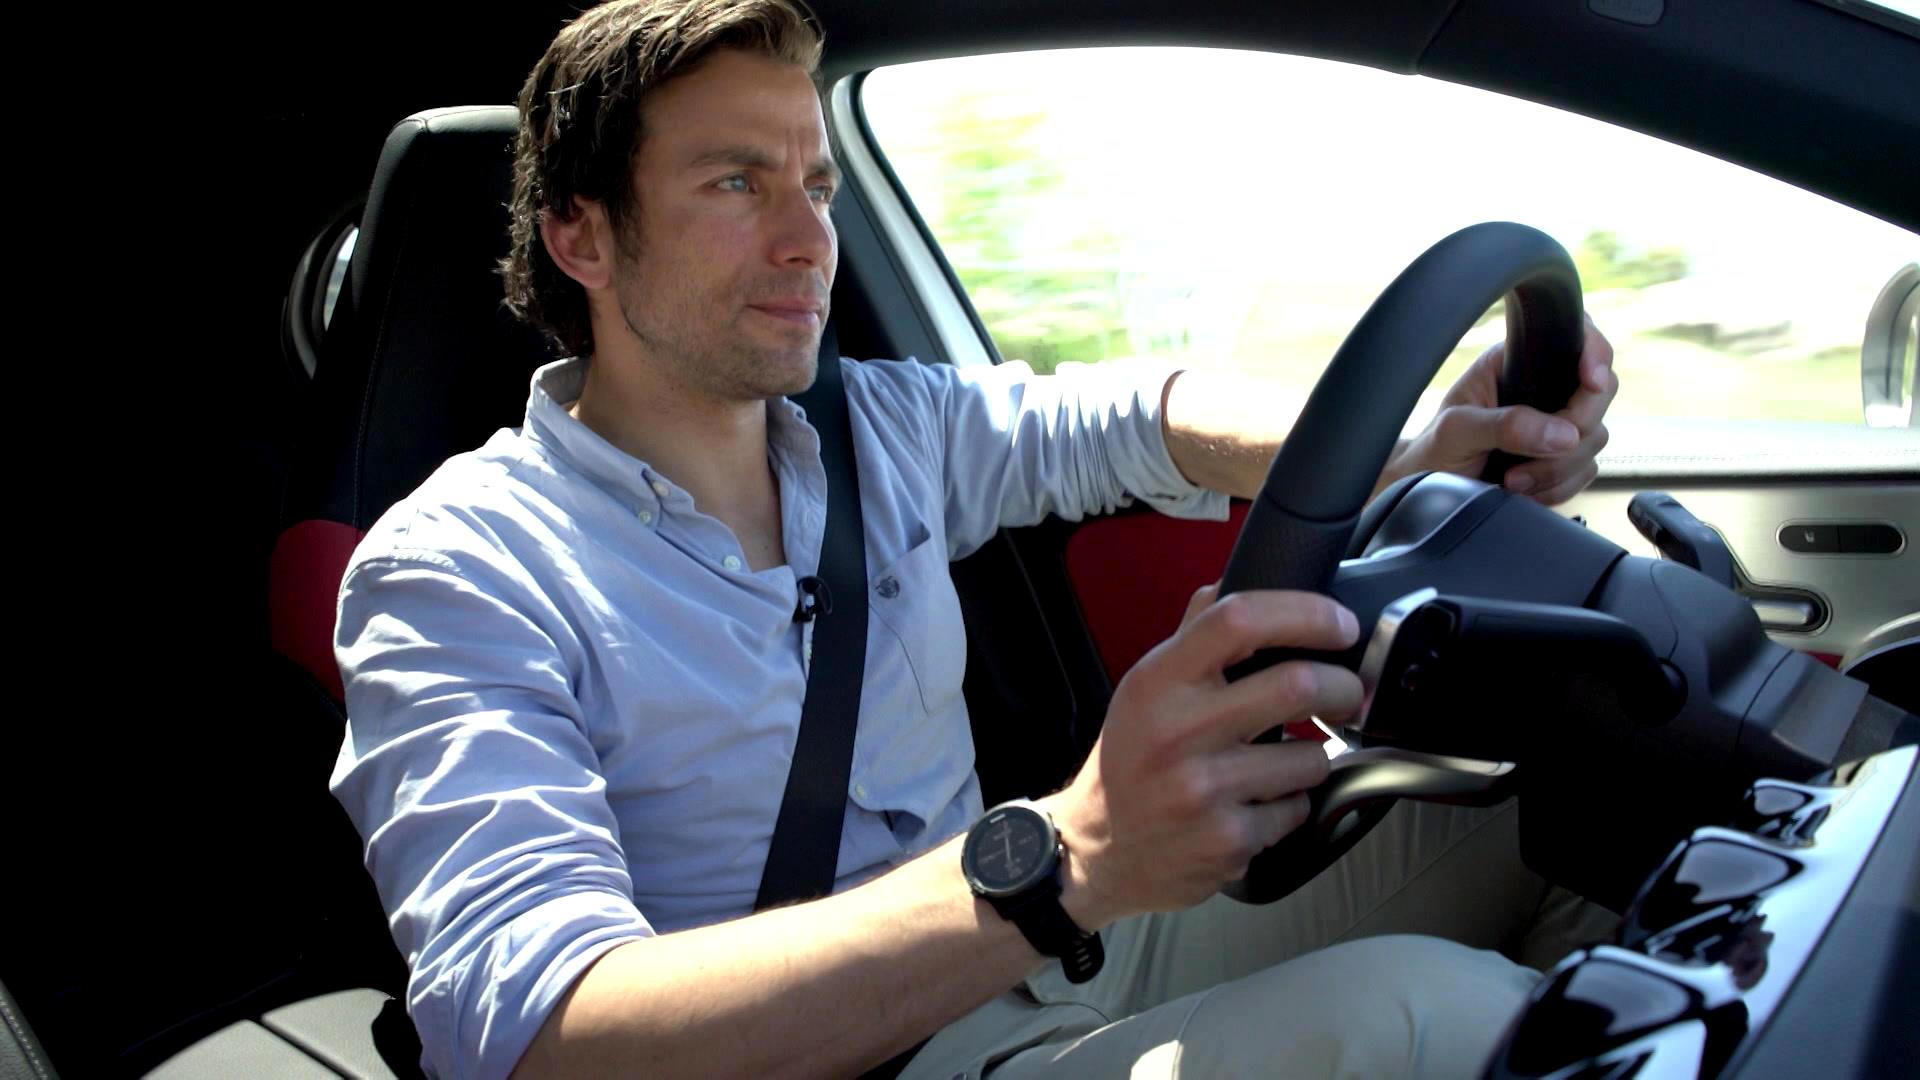 Thema u.a.: Fahrbericht: Mercedes A-Klasse mit Andy | Folge 22